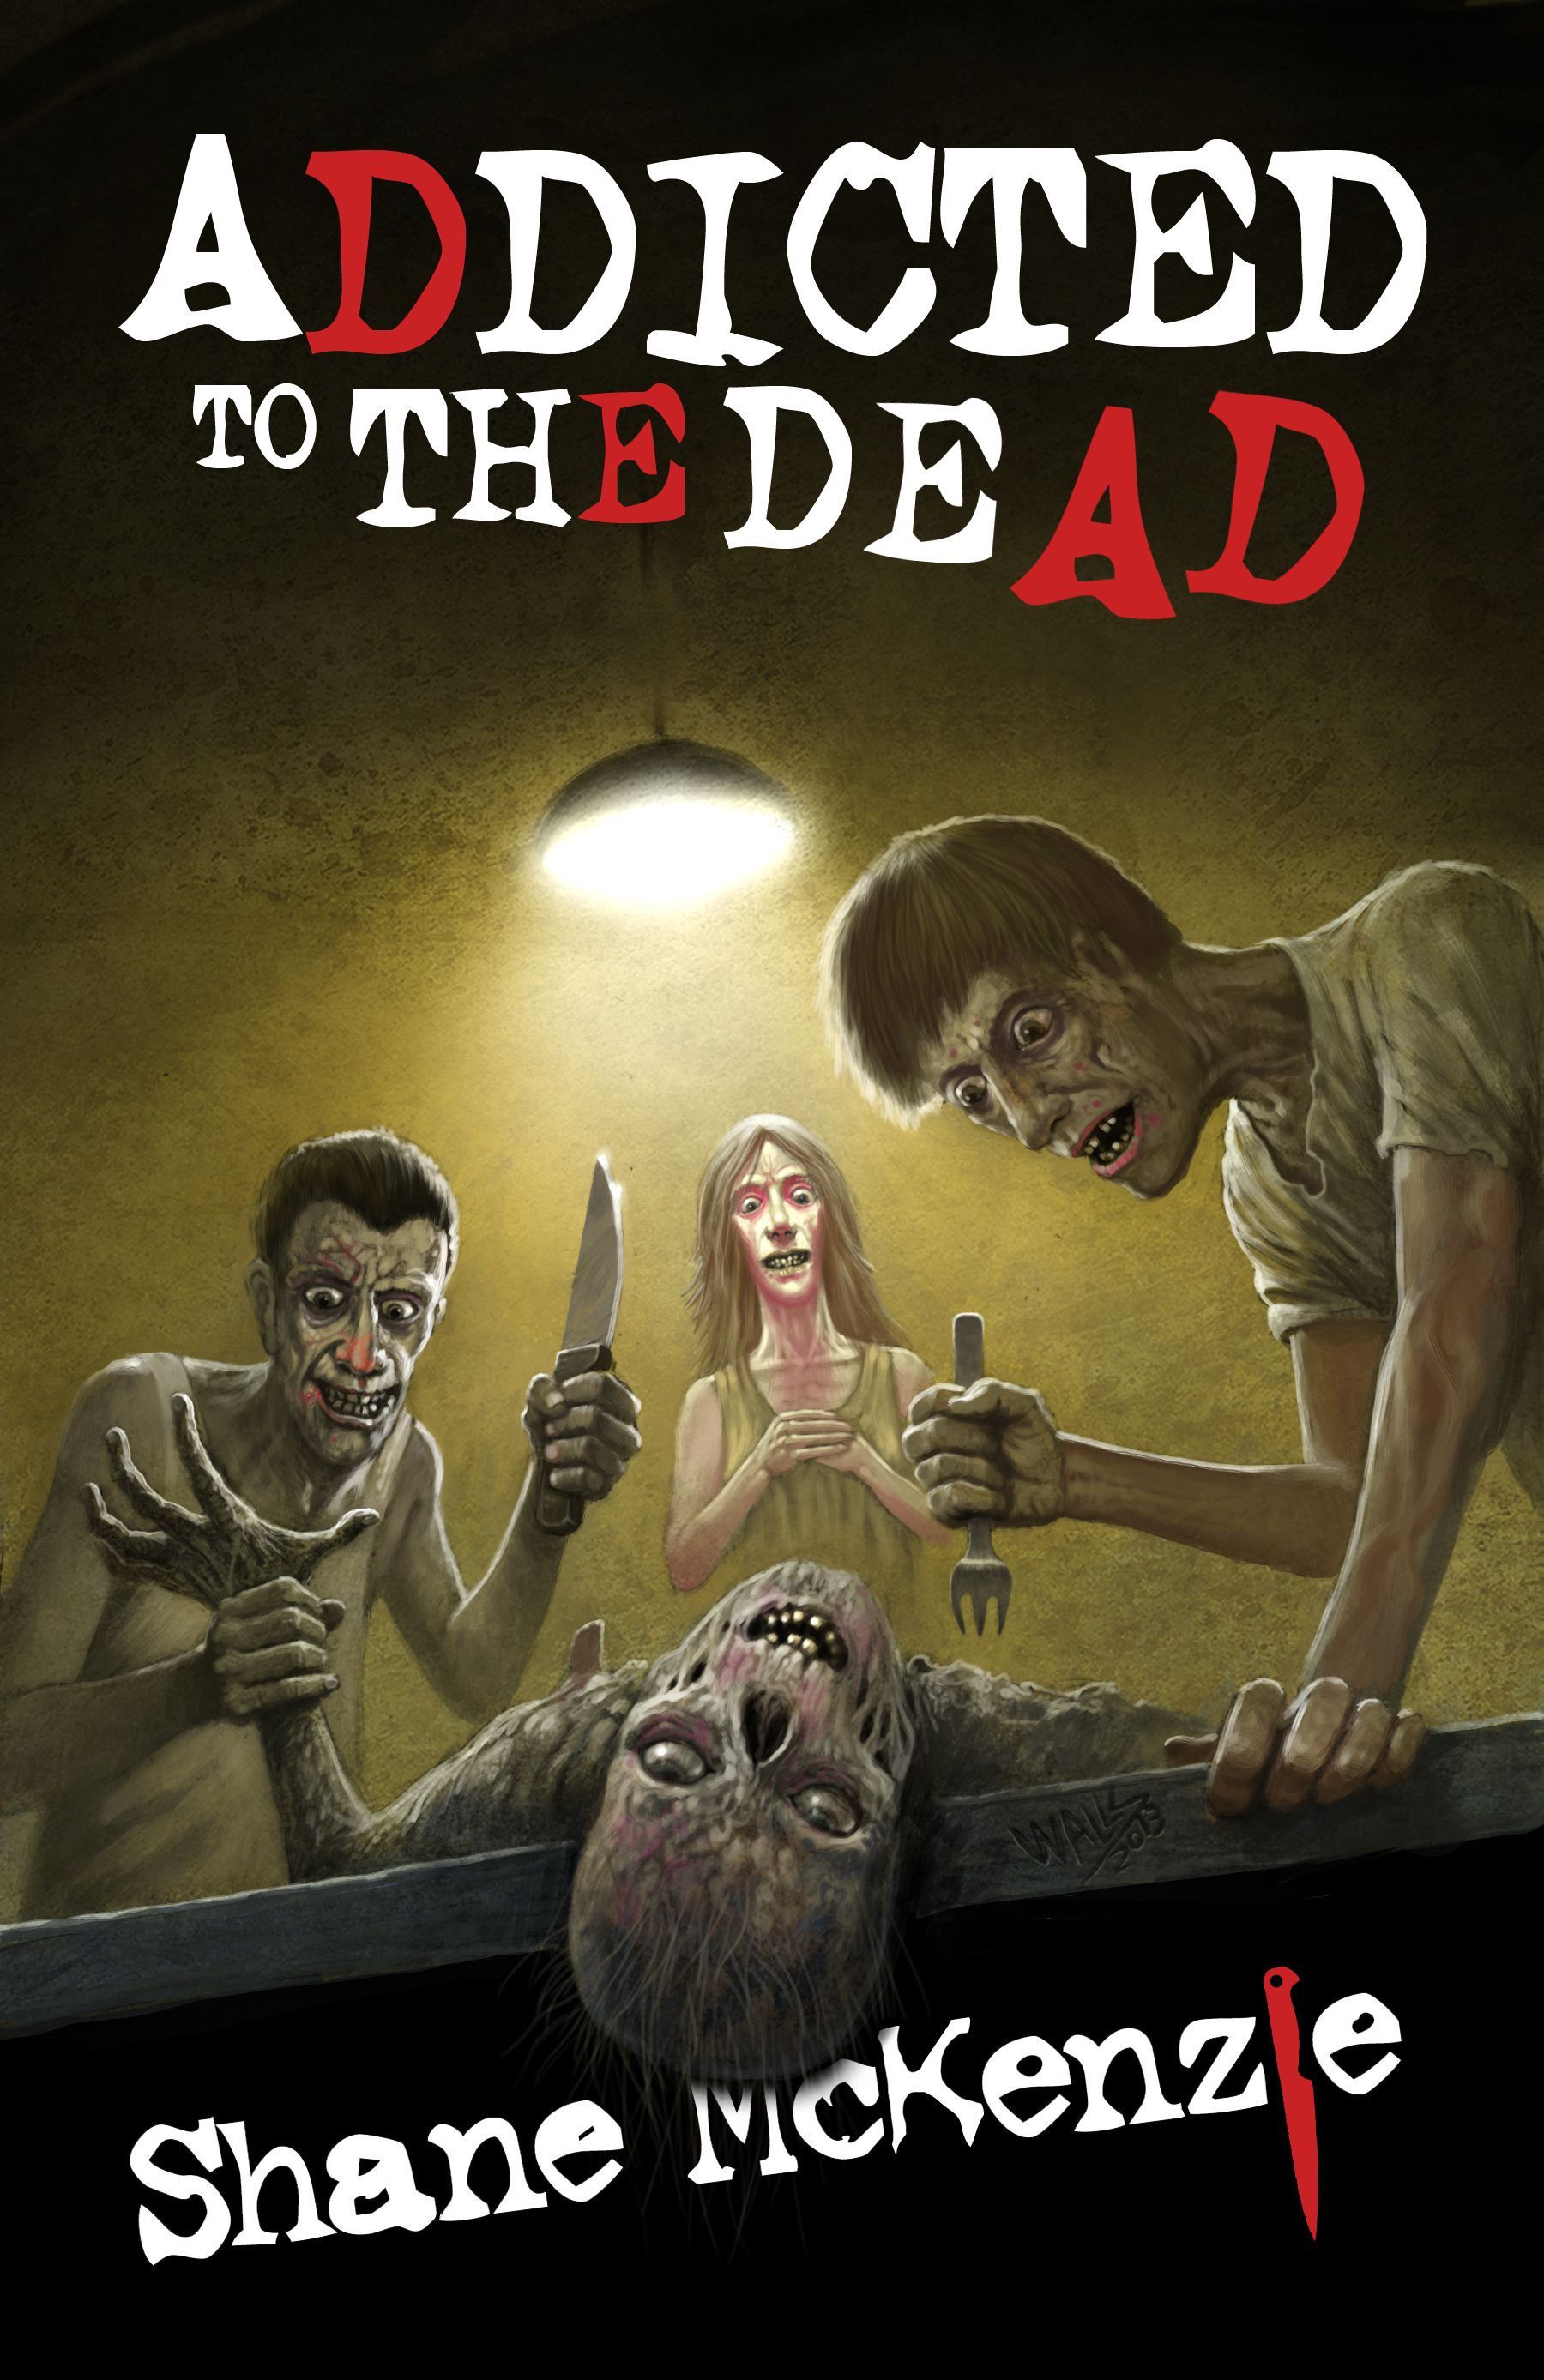 Dark Regions Press - Addicted to the Dead